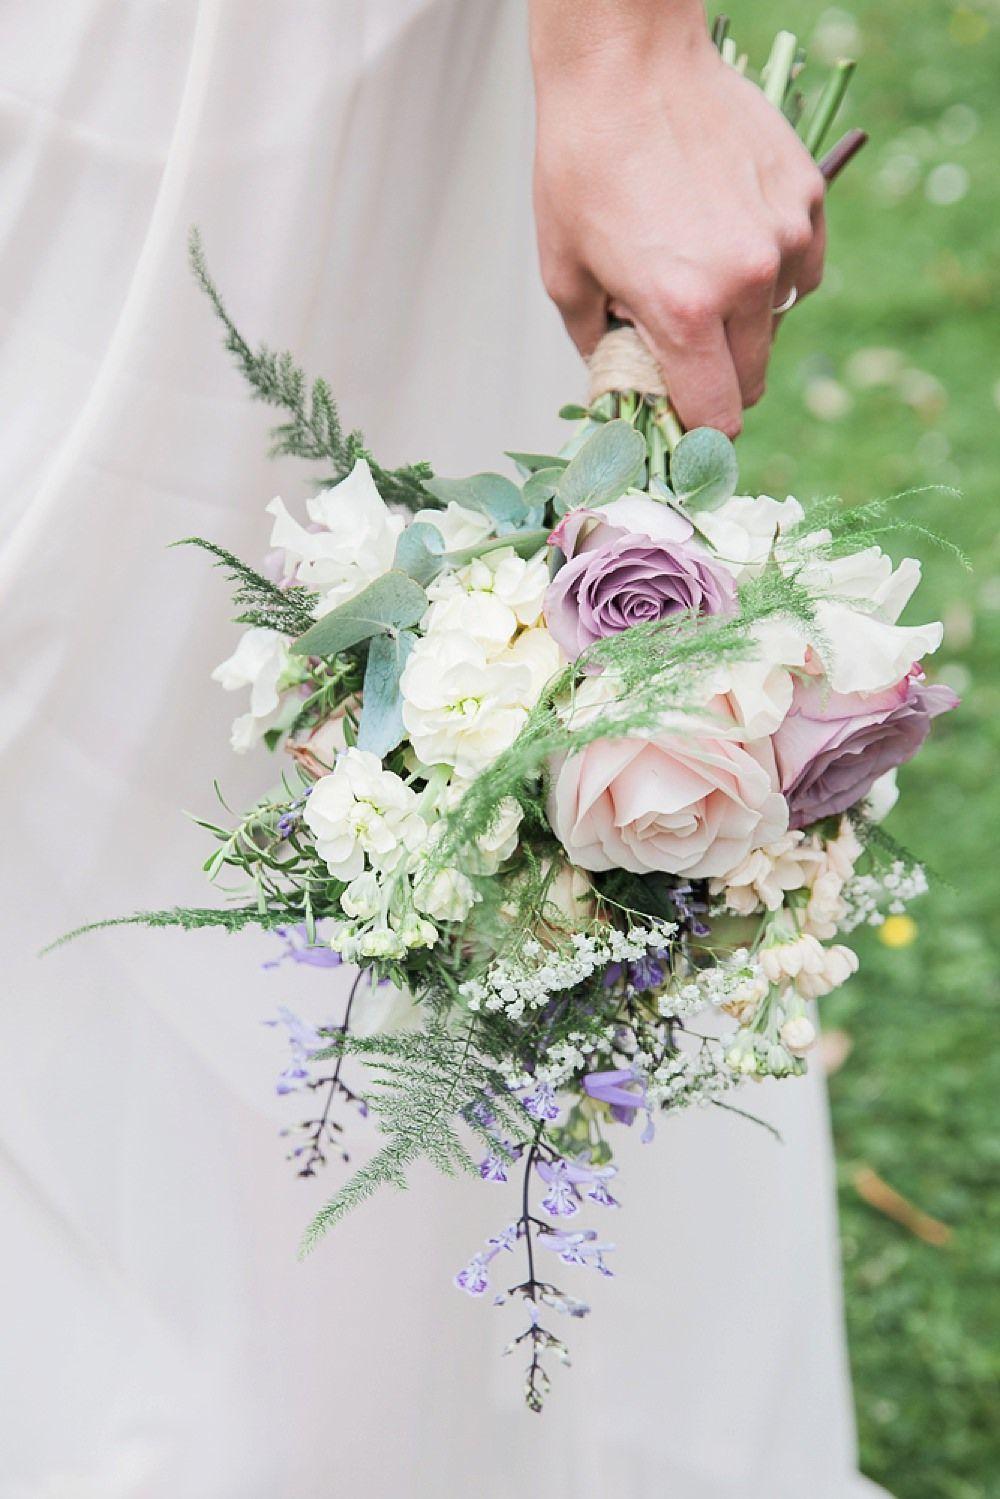 Romantic Vintage Rose Lilac Bouquet | Kate Halfpenny Iris Wedding Dress | Rachel Simpson Shoes | Lainston House Barn Venue | McKenzie Brown Photography | http://www.rockmywedding.co.uk/sarah-nathan/